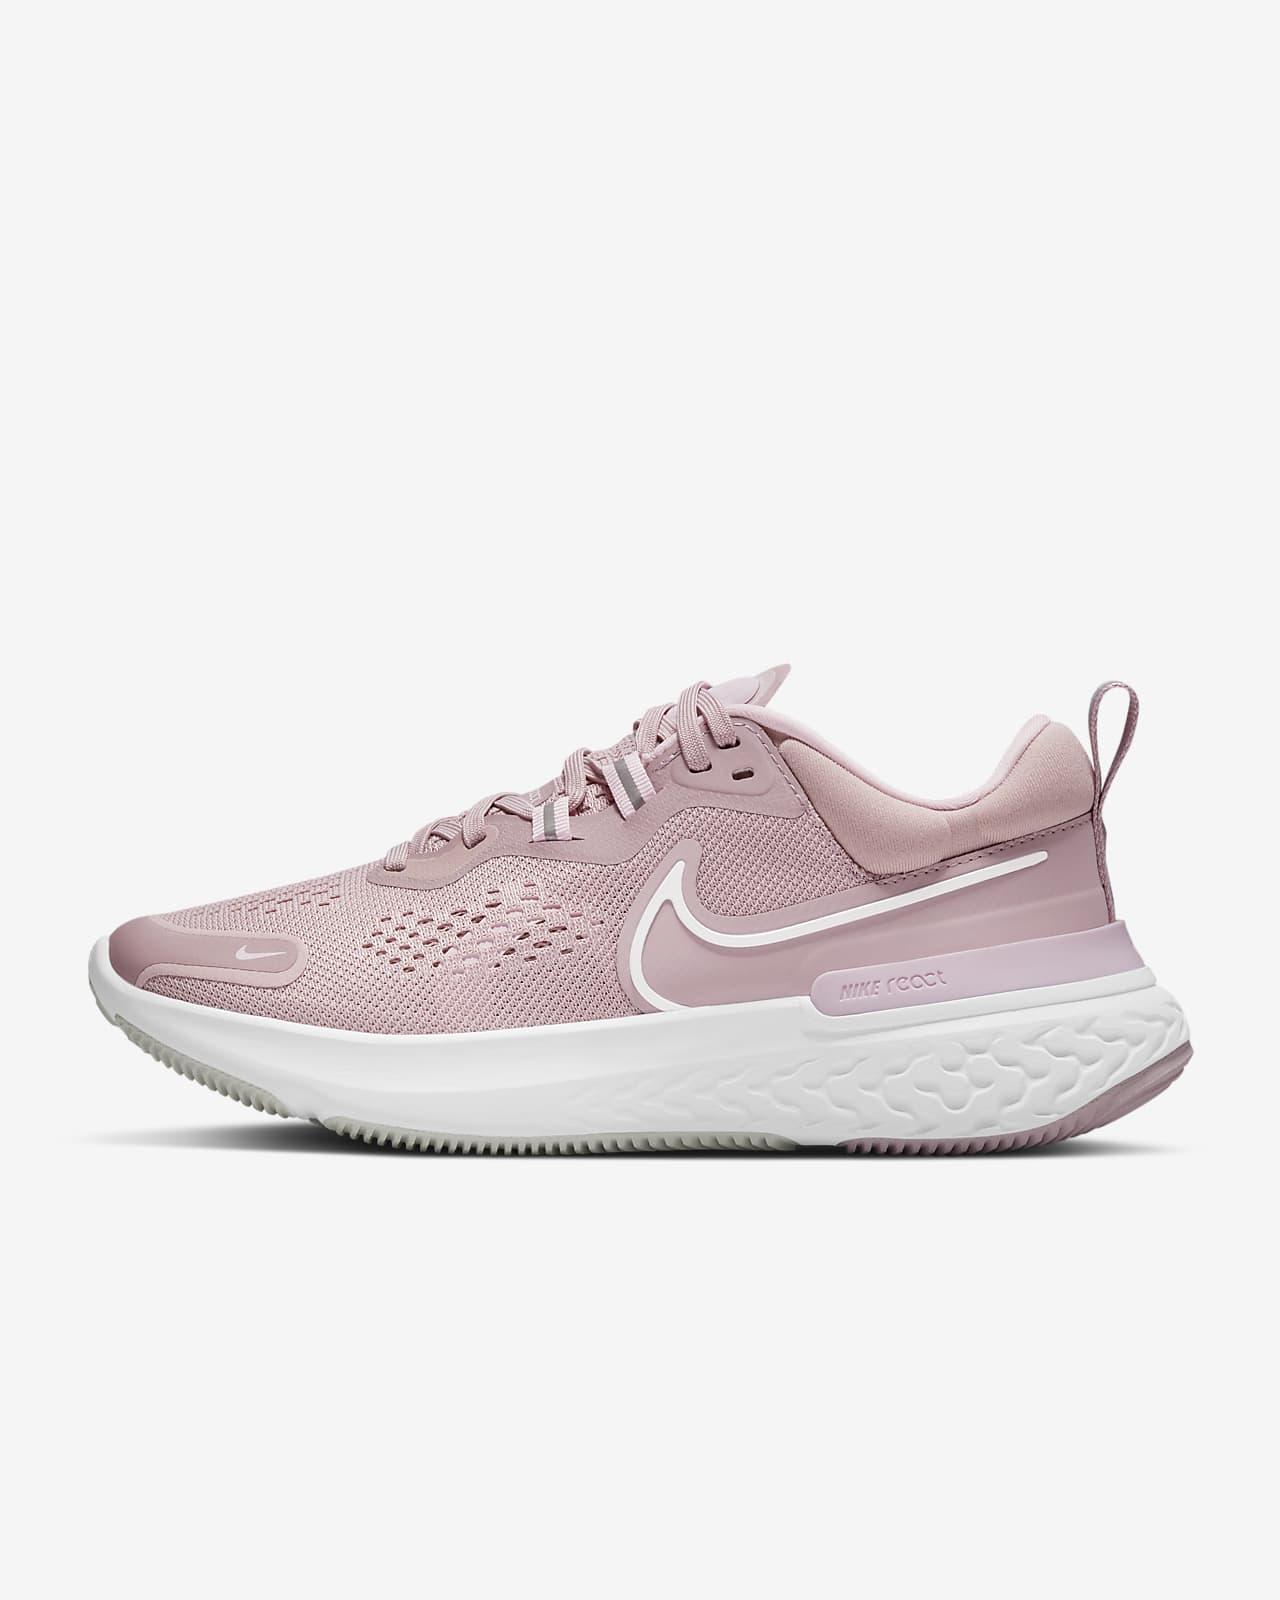 Nike React Miler 2 Women's Road Running Shoes. Nike LU